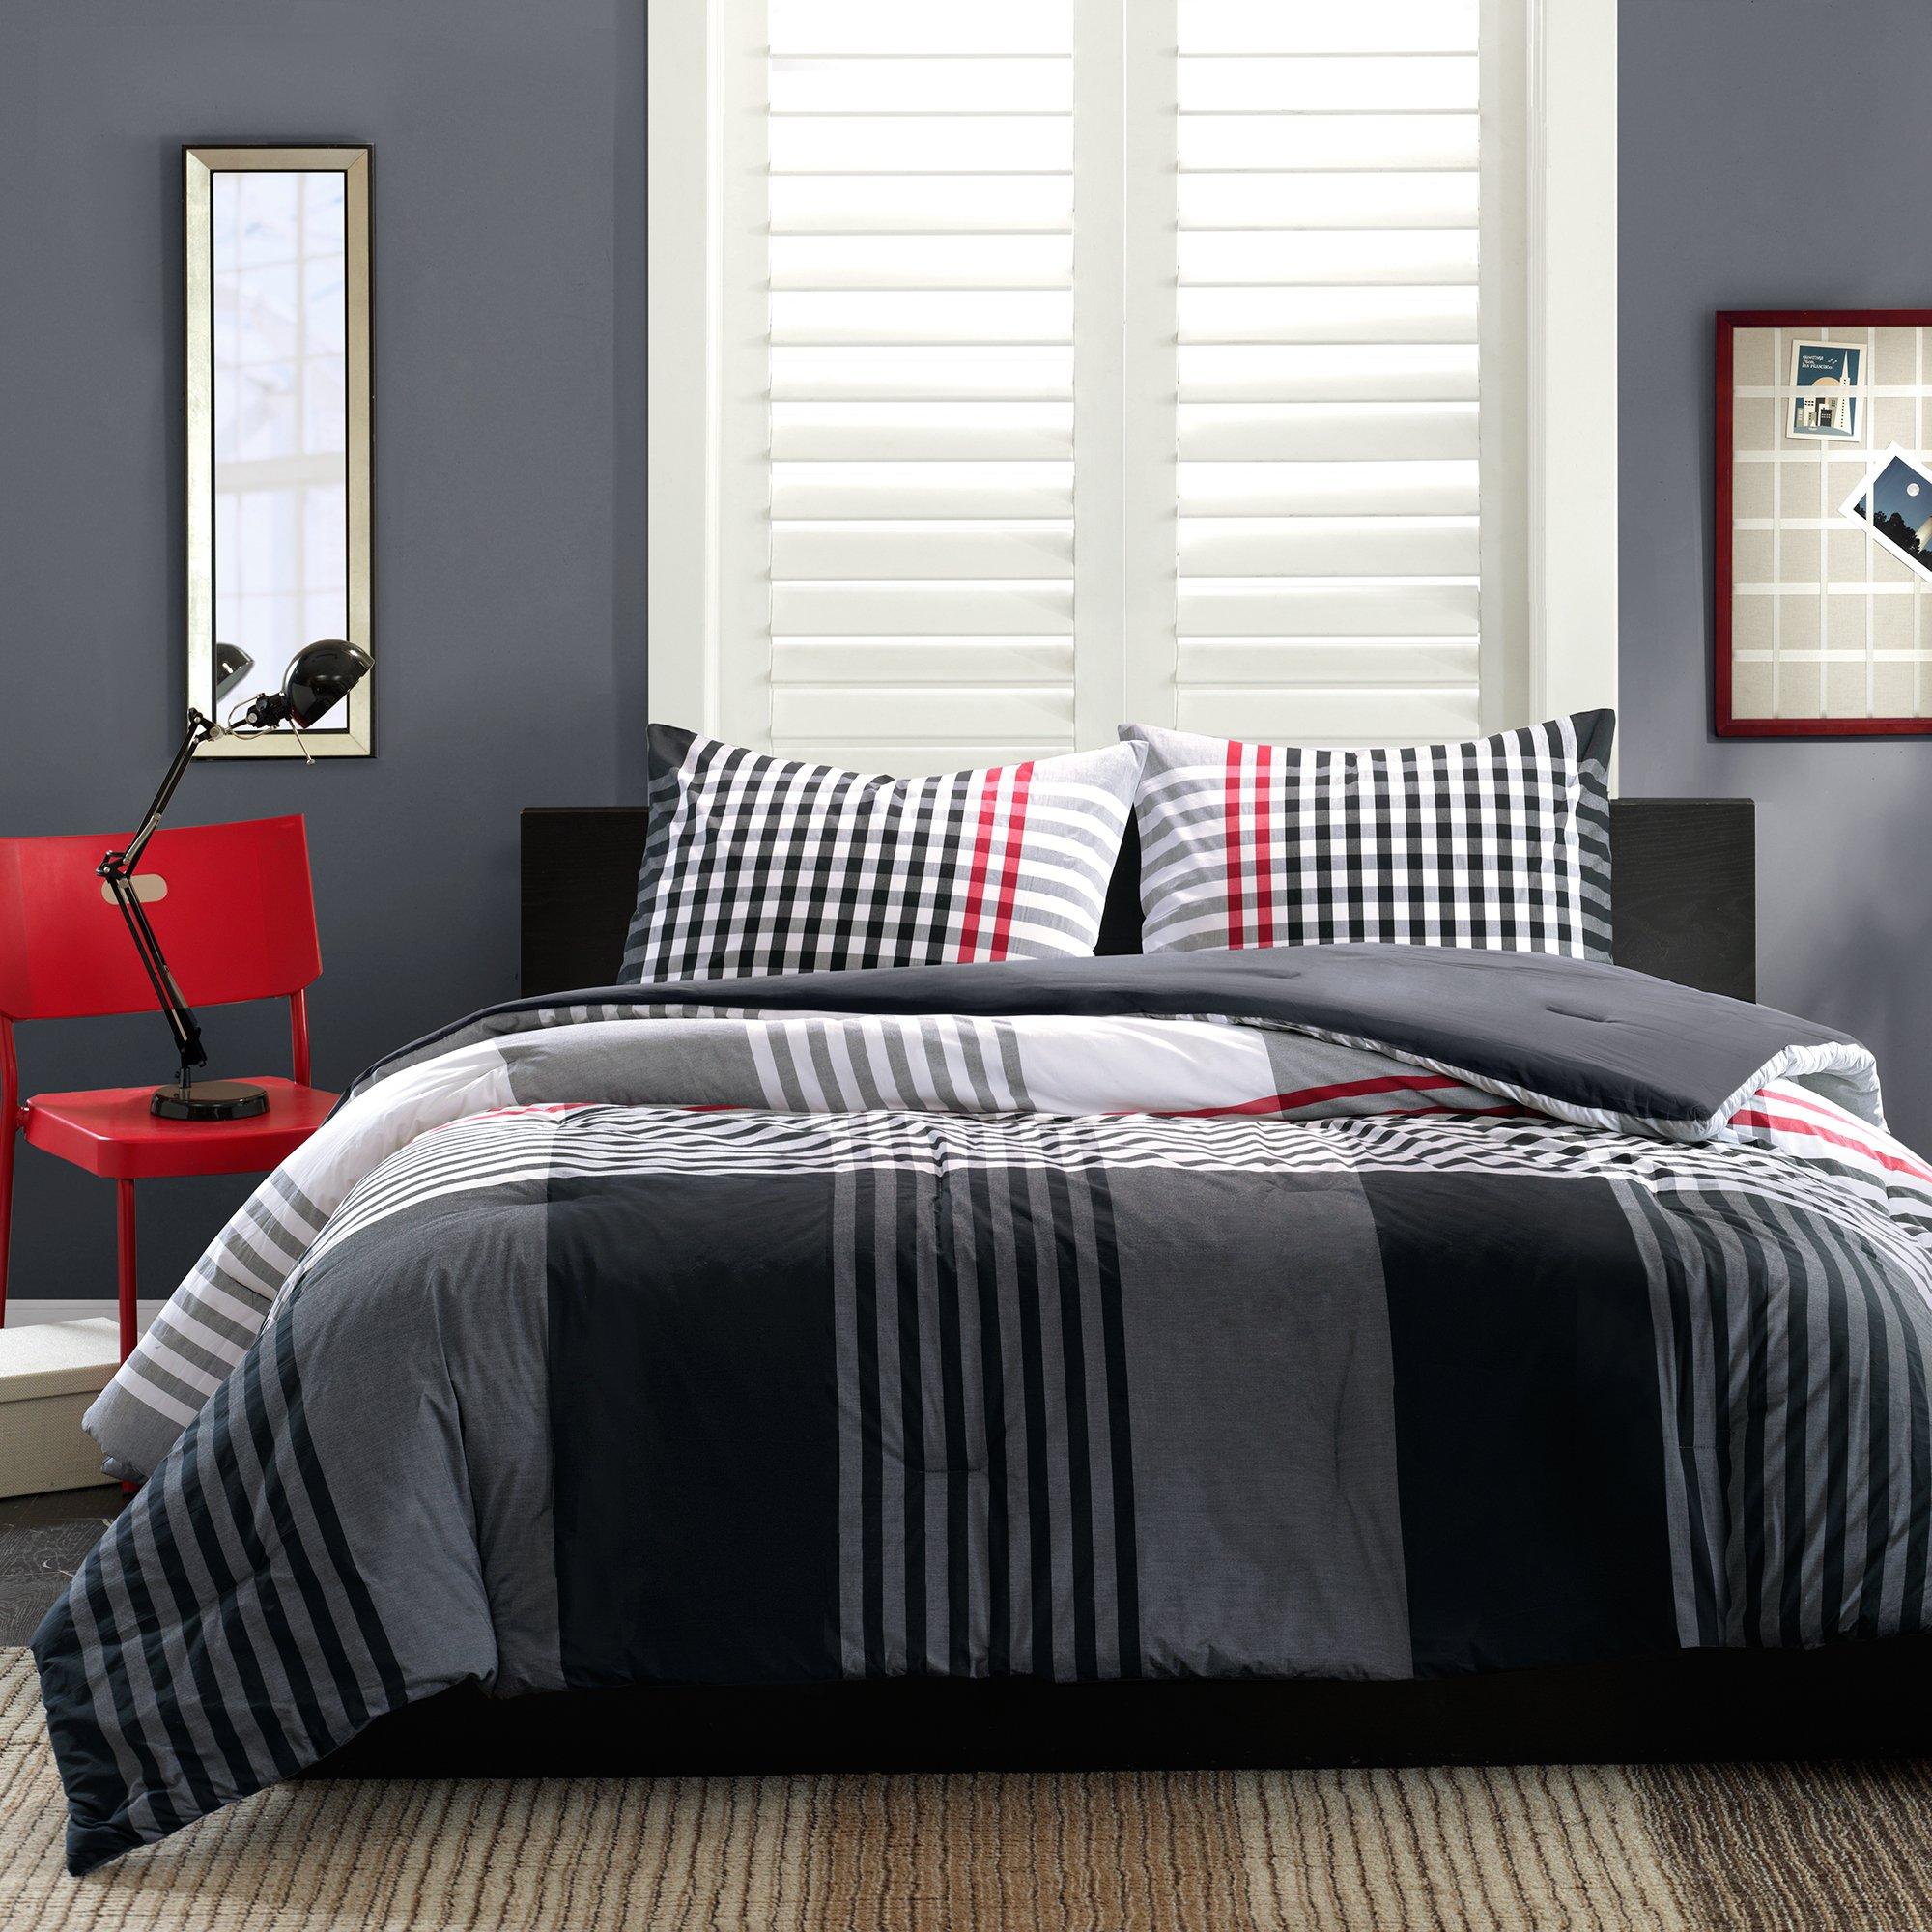 Ink+Ivy Blake 3-Piece Comforter Set, Full/Queen, Black by Ink+Ivy (Image #1)